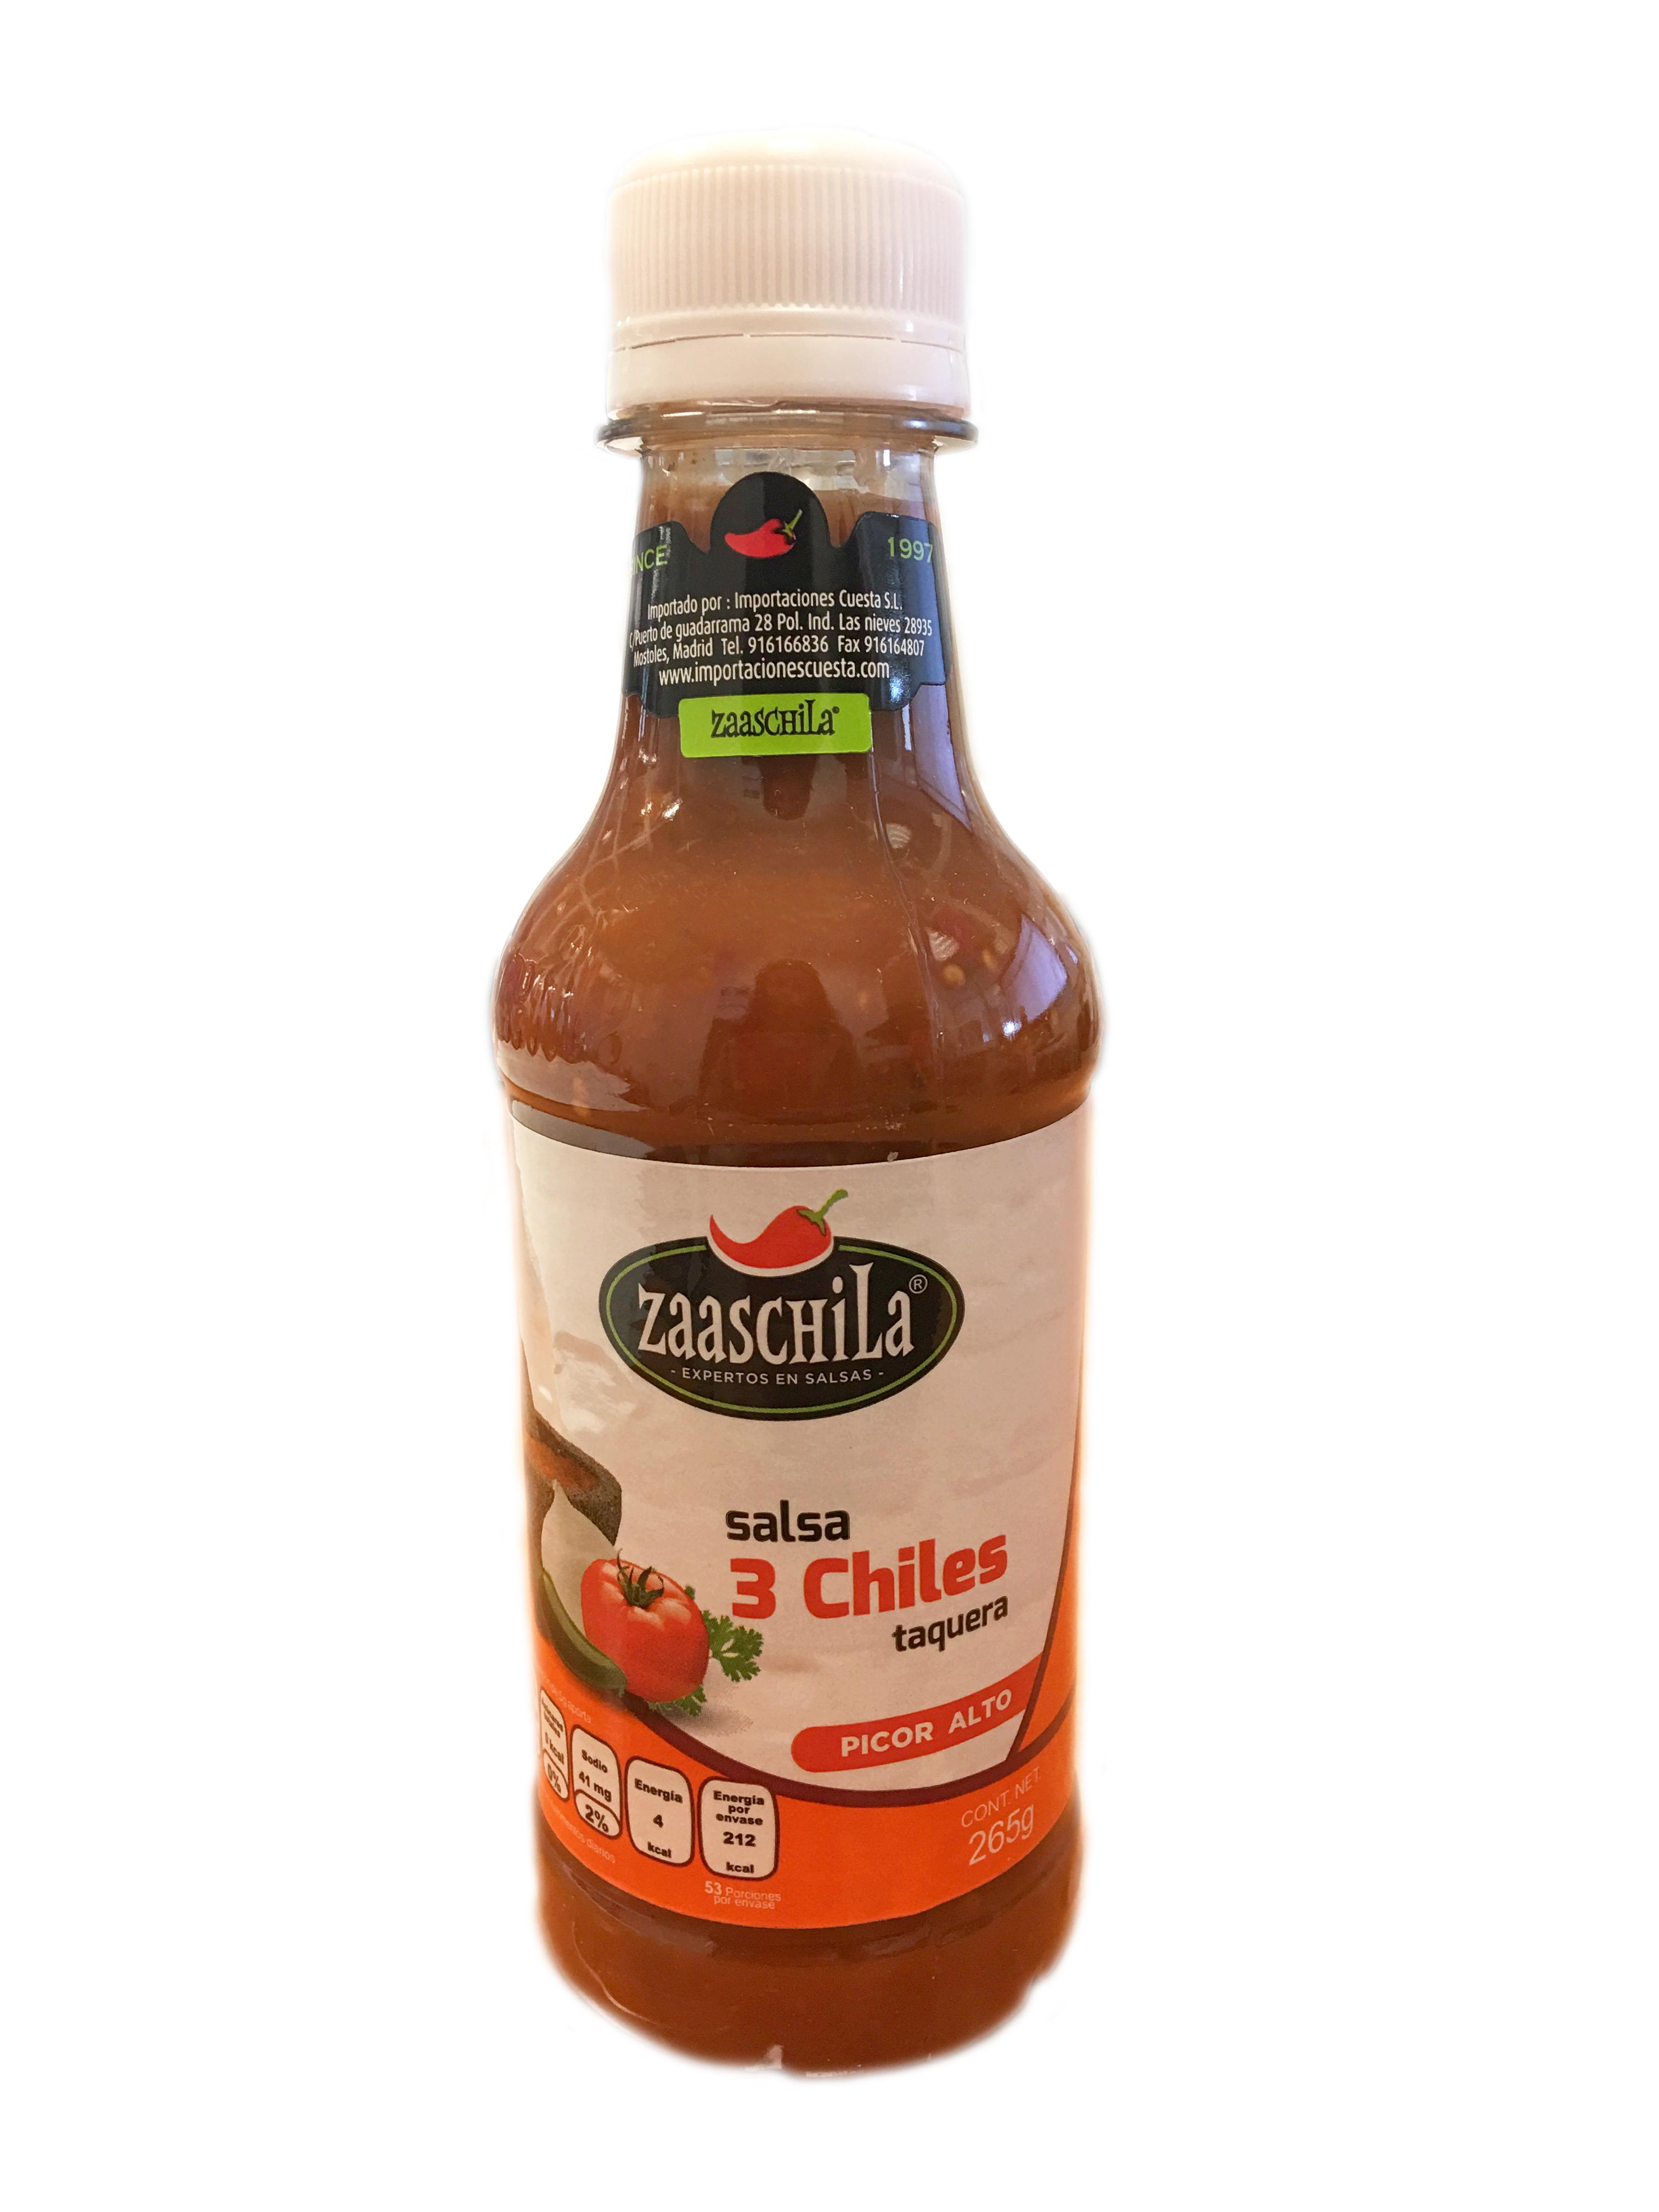 Salsa 3 chiles Zaaschila 265g botella de plástico